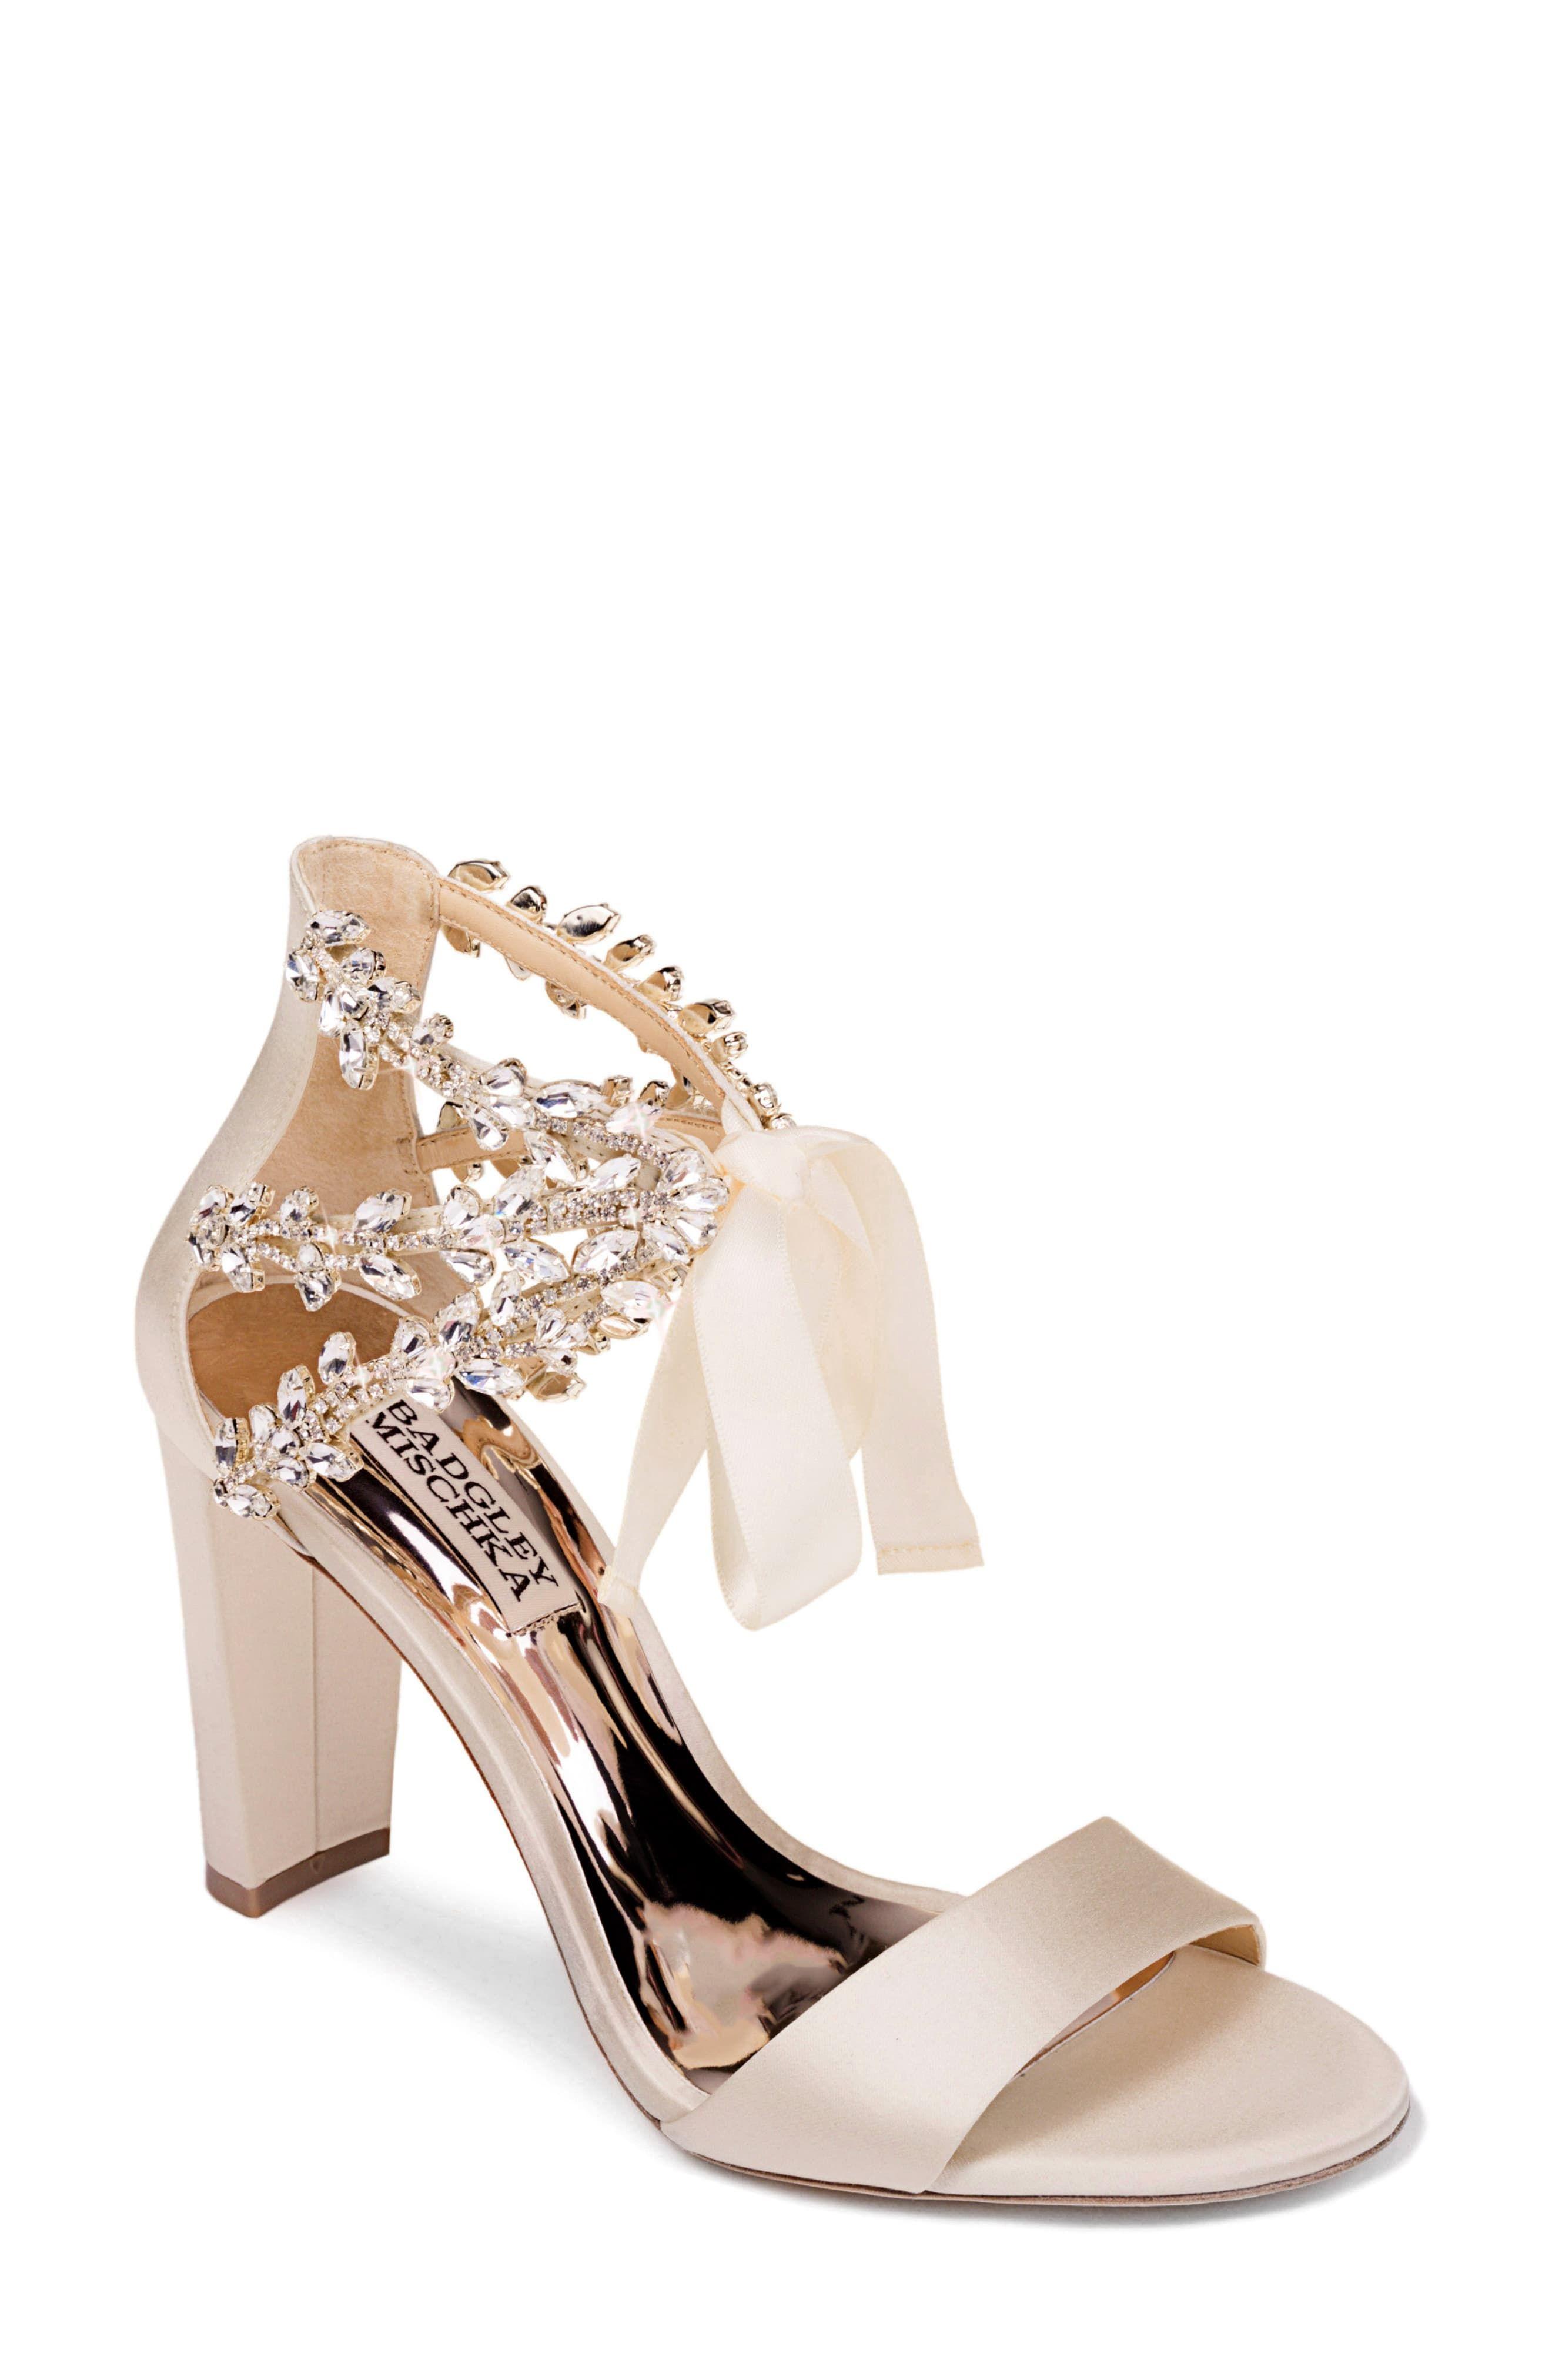 Women S Badgley Mischka Ever After Embellished Sandal Size 8 M Ivory In 2020 Wedding Shoes Heels Bride Shoes Bridal Shoes